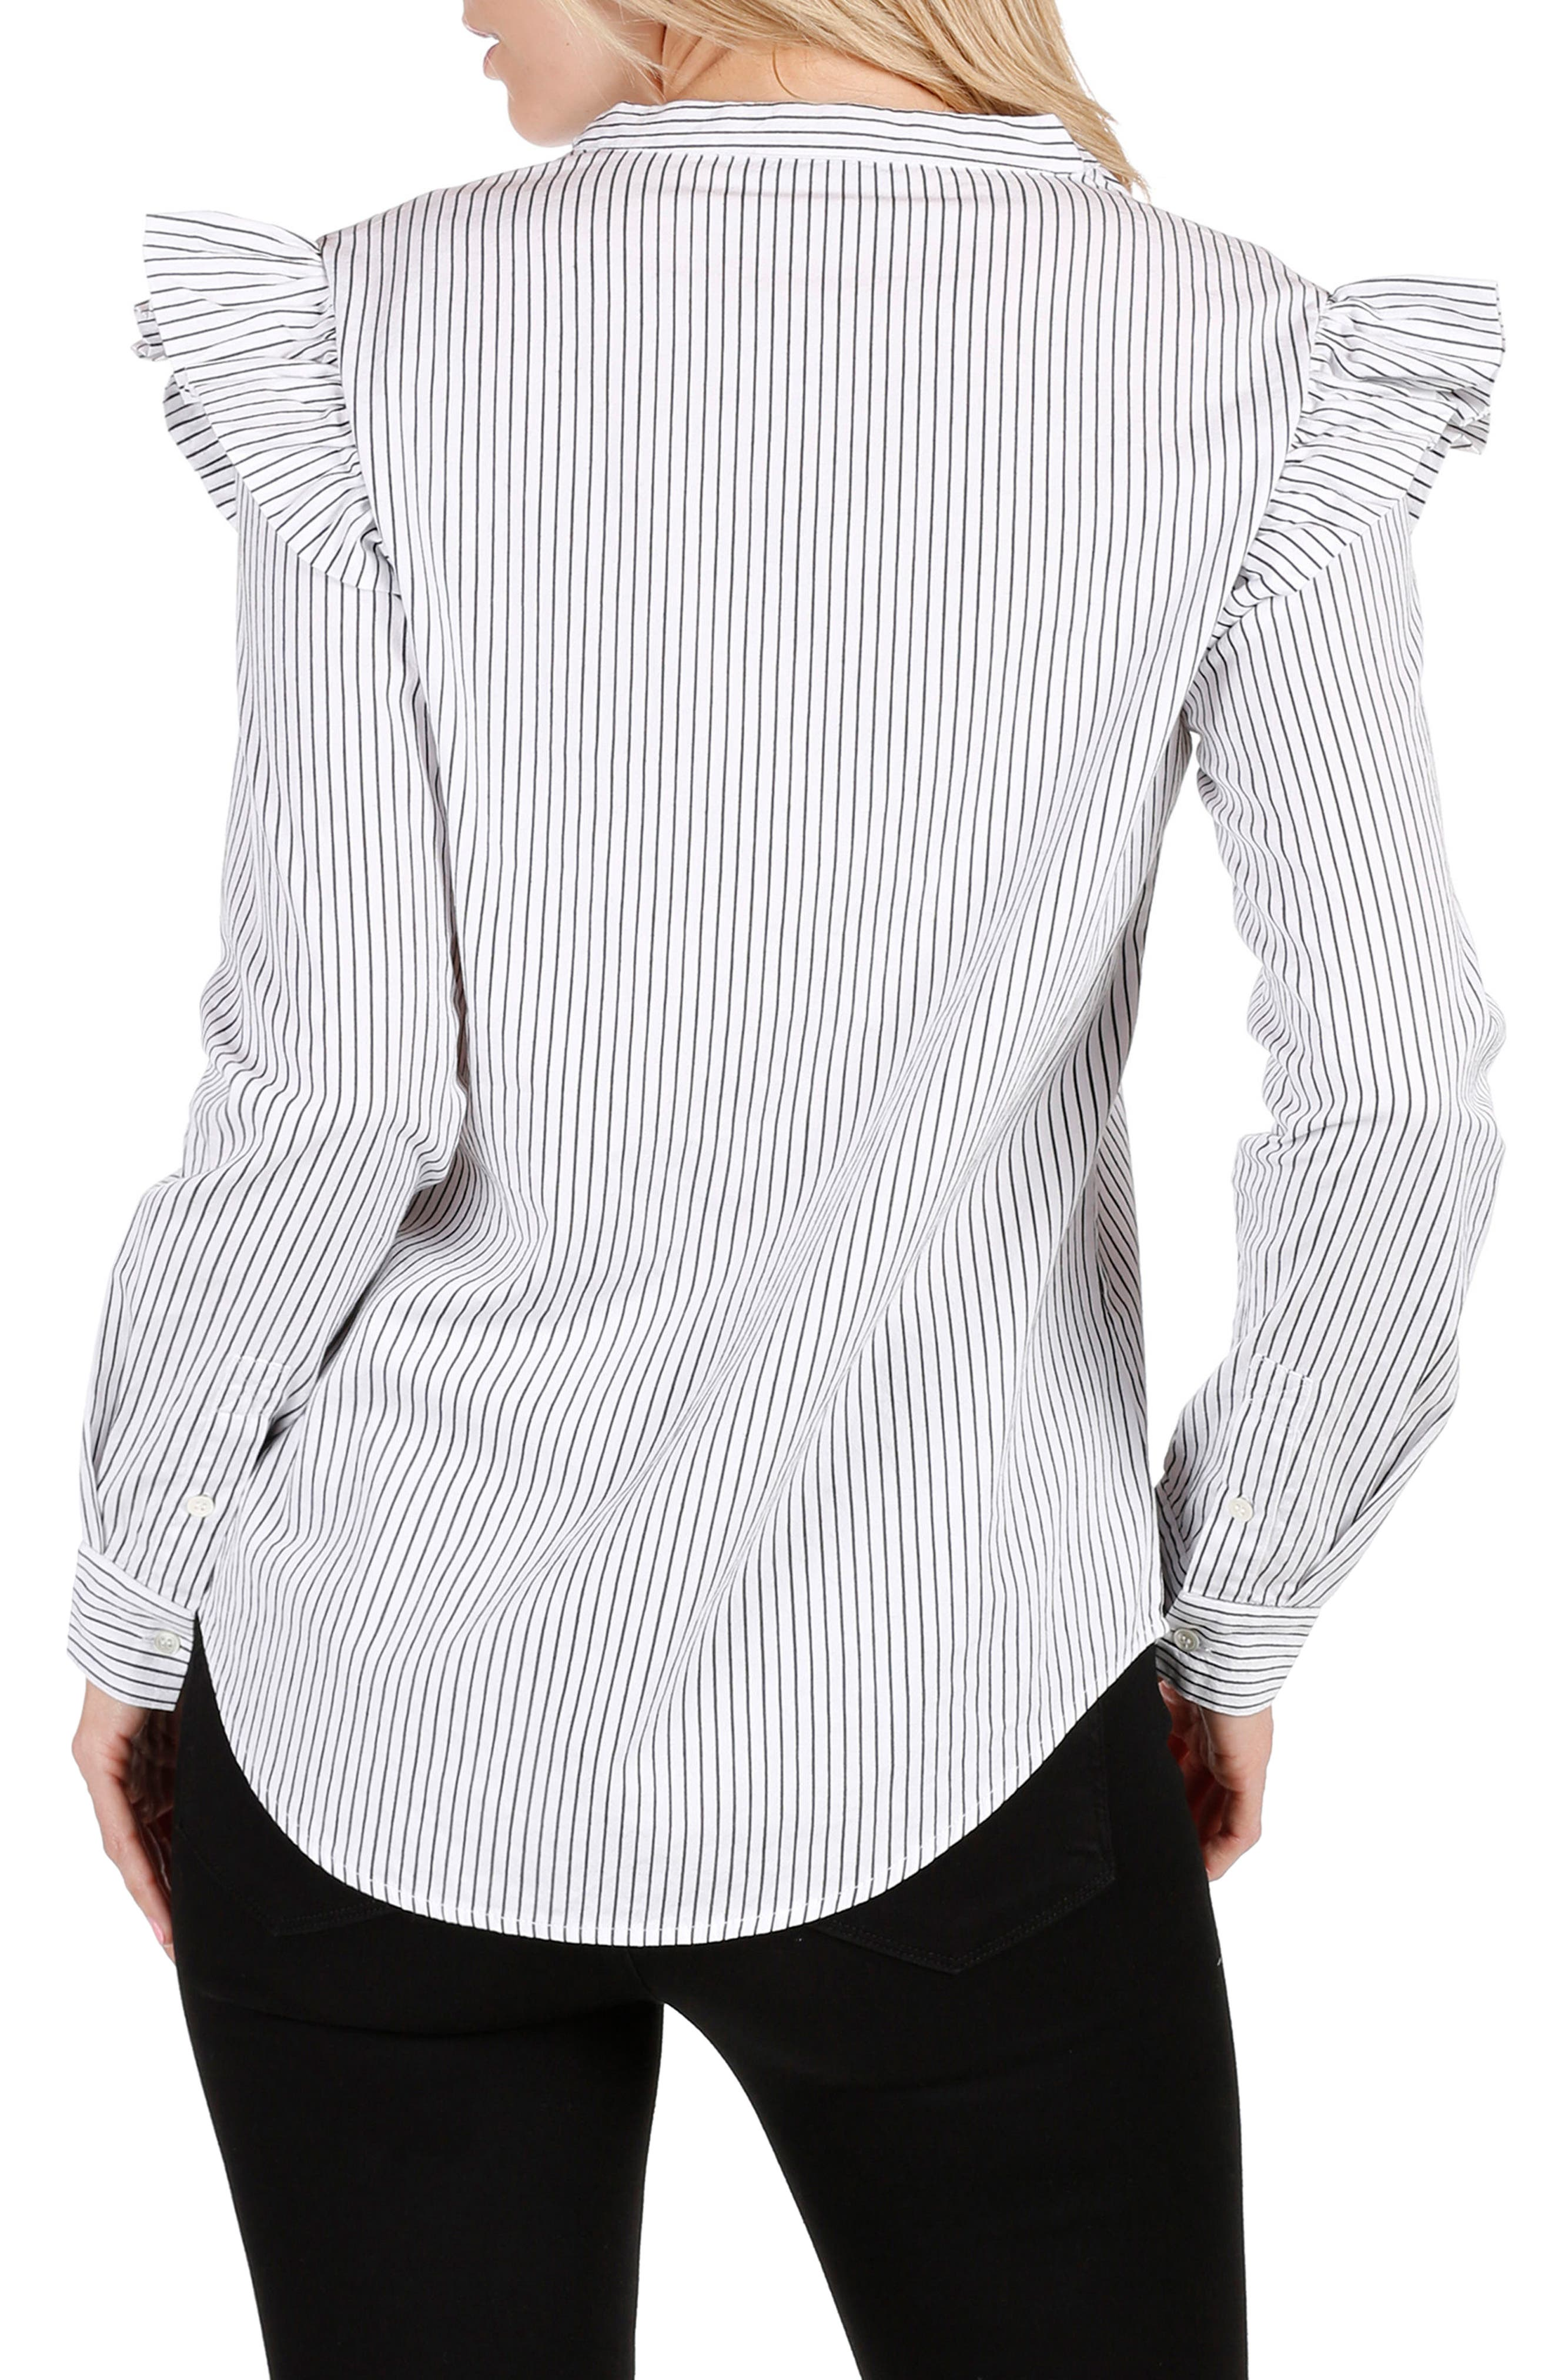 Jenelle Ruffle Dress Shirt,                             Alternate thumbnail 3, color,                             160